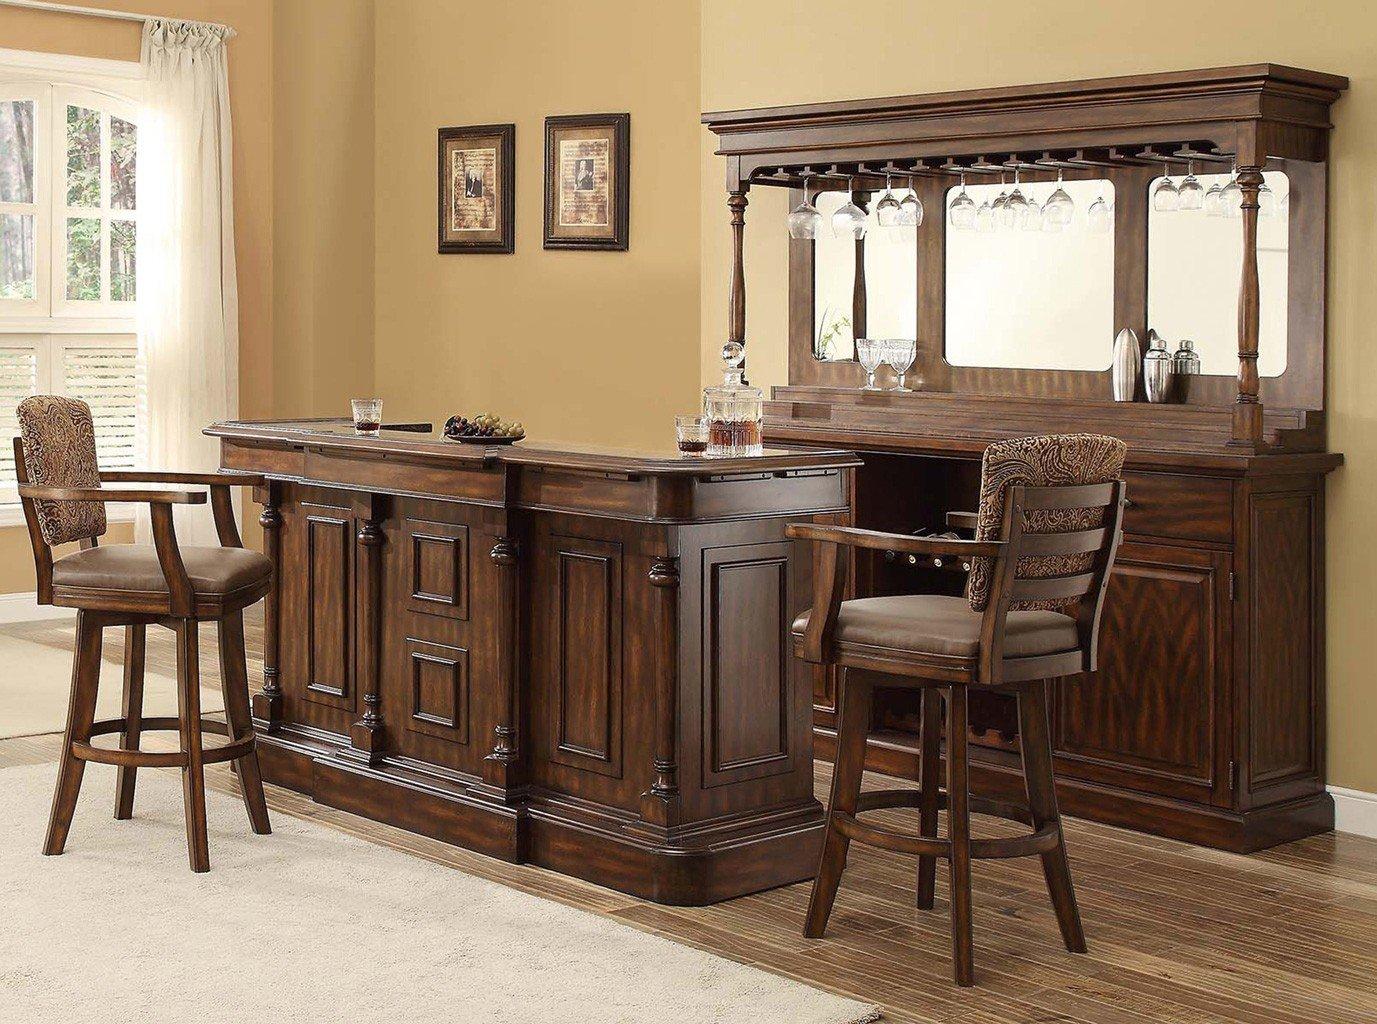 Trafalgar Square Deluxe Home Bar Set By Eci Furniture Furniturepick